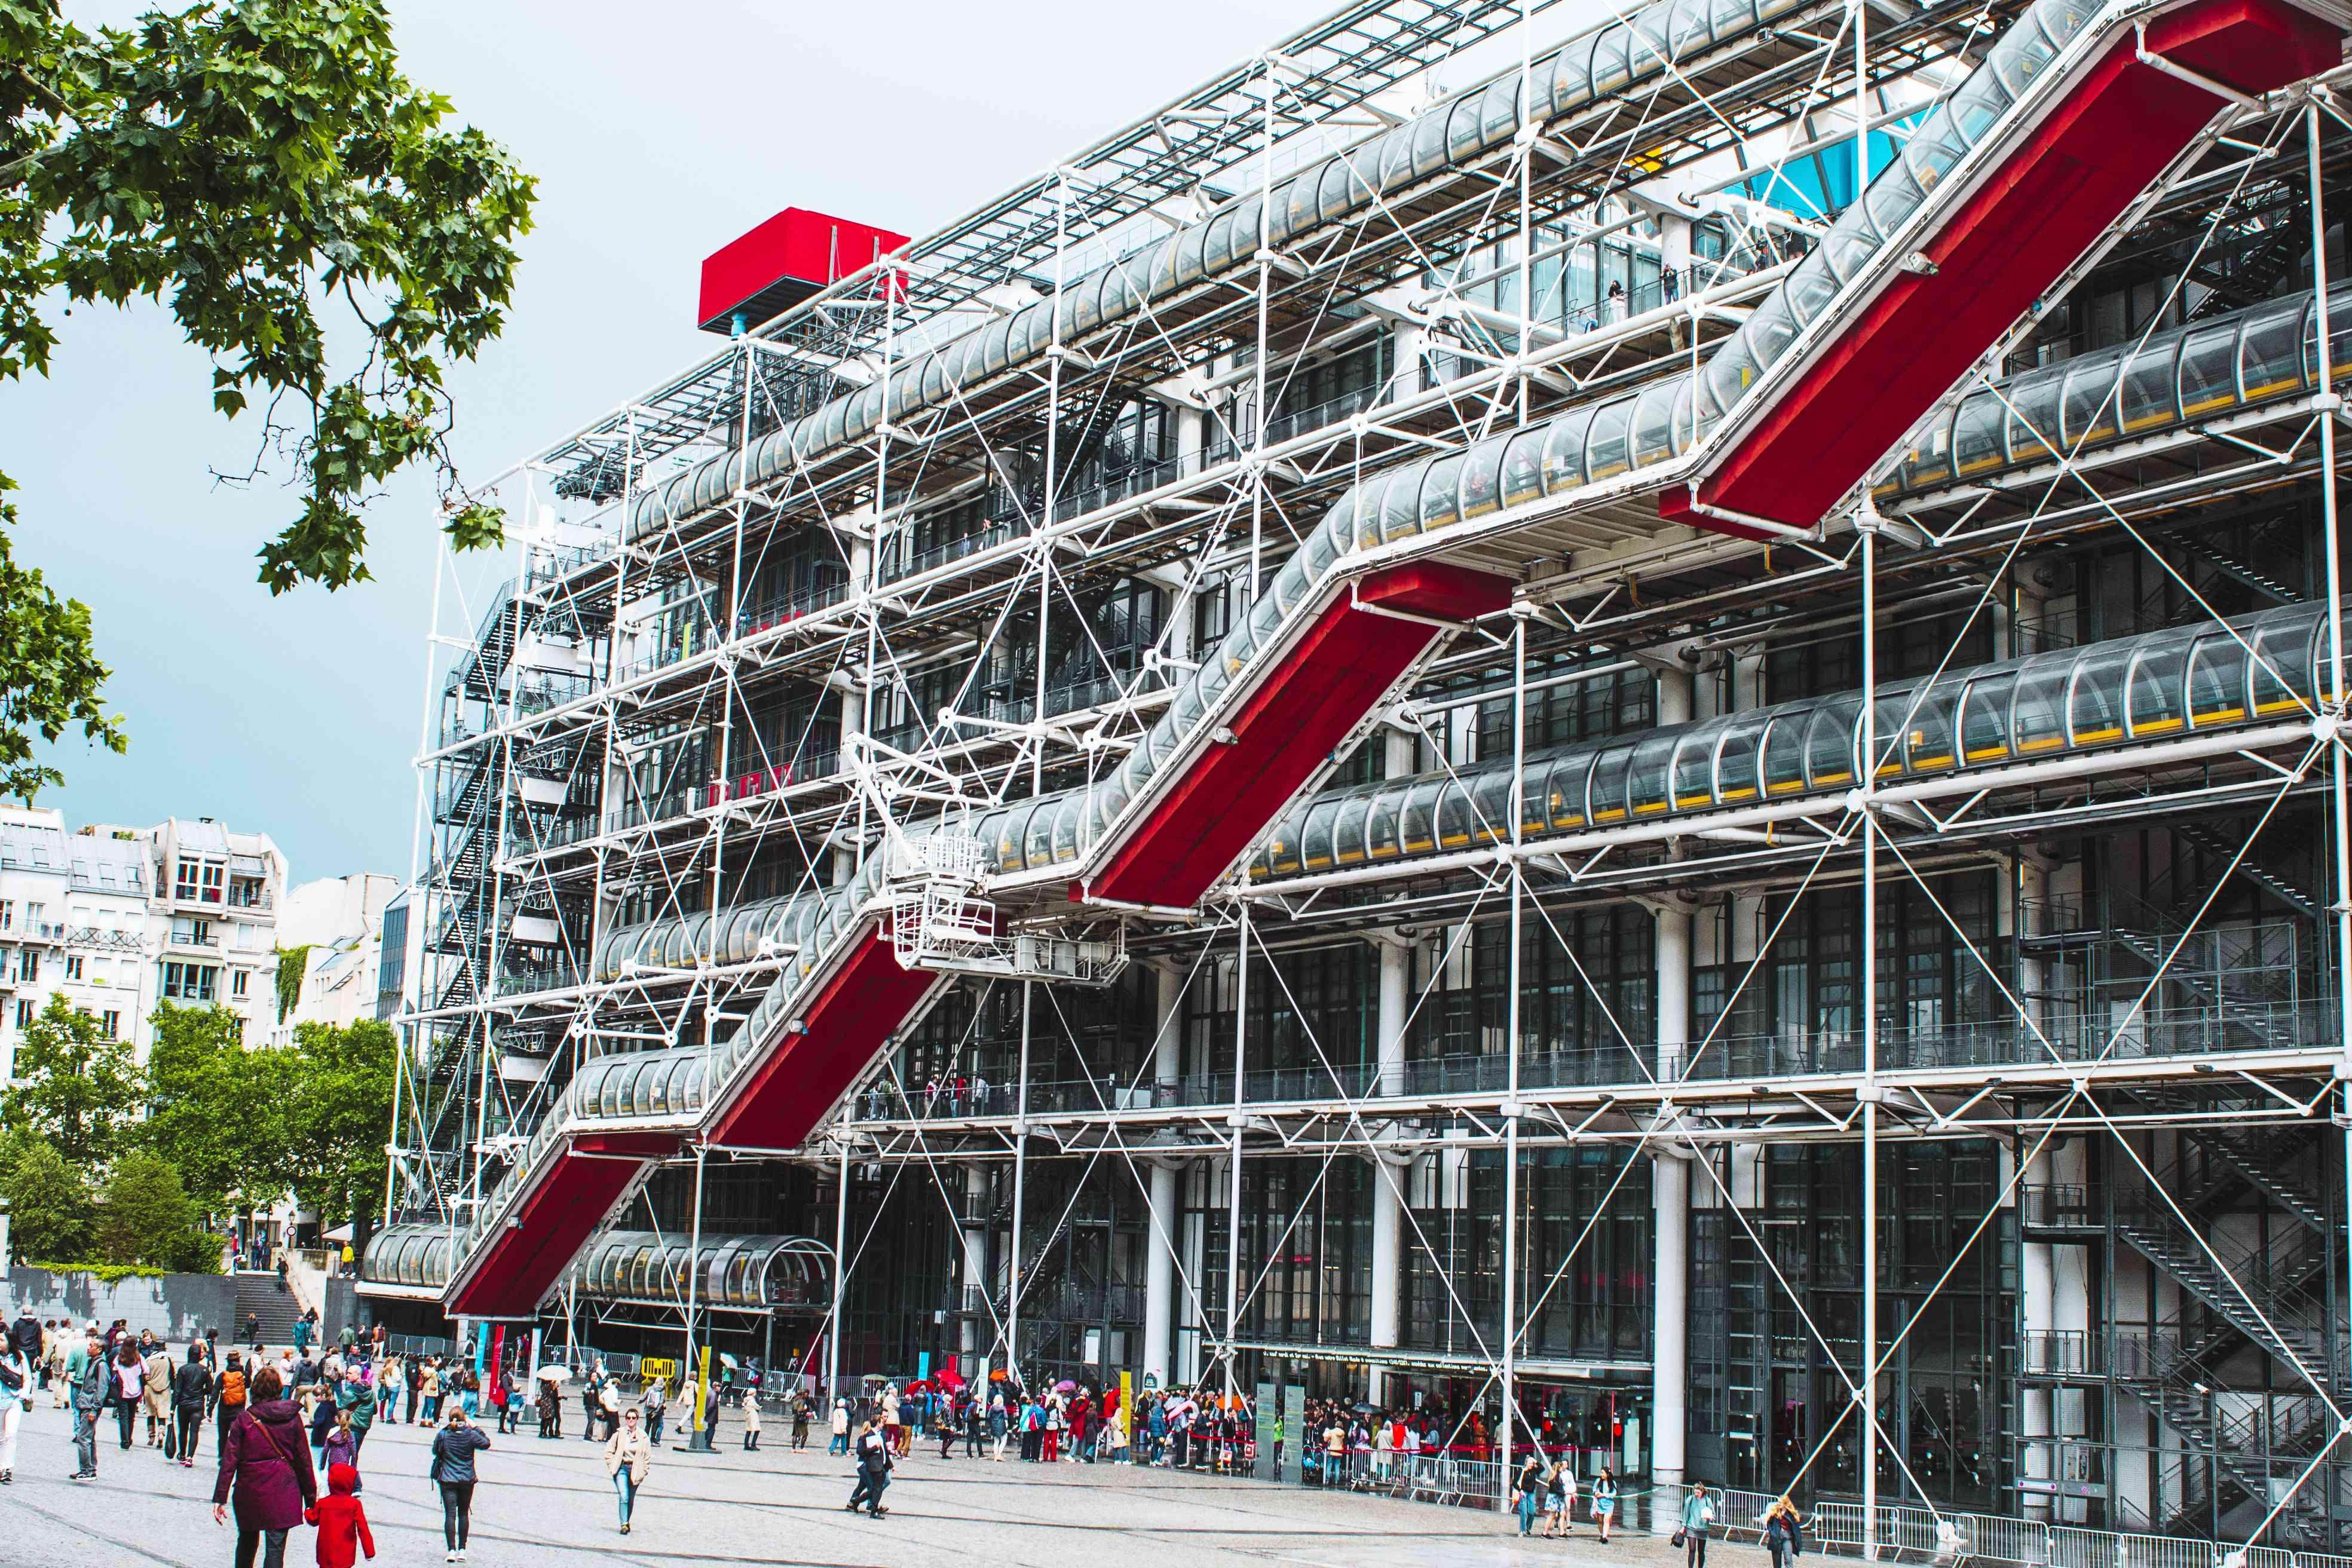 Entrance to Centre Pompidou